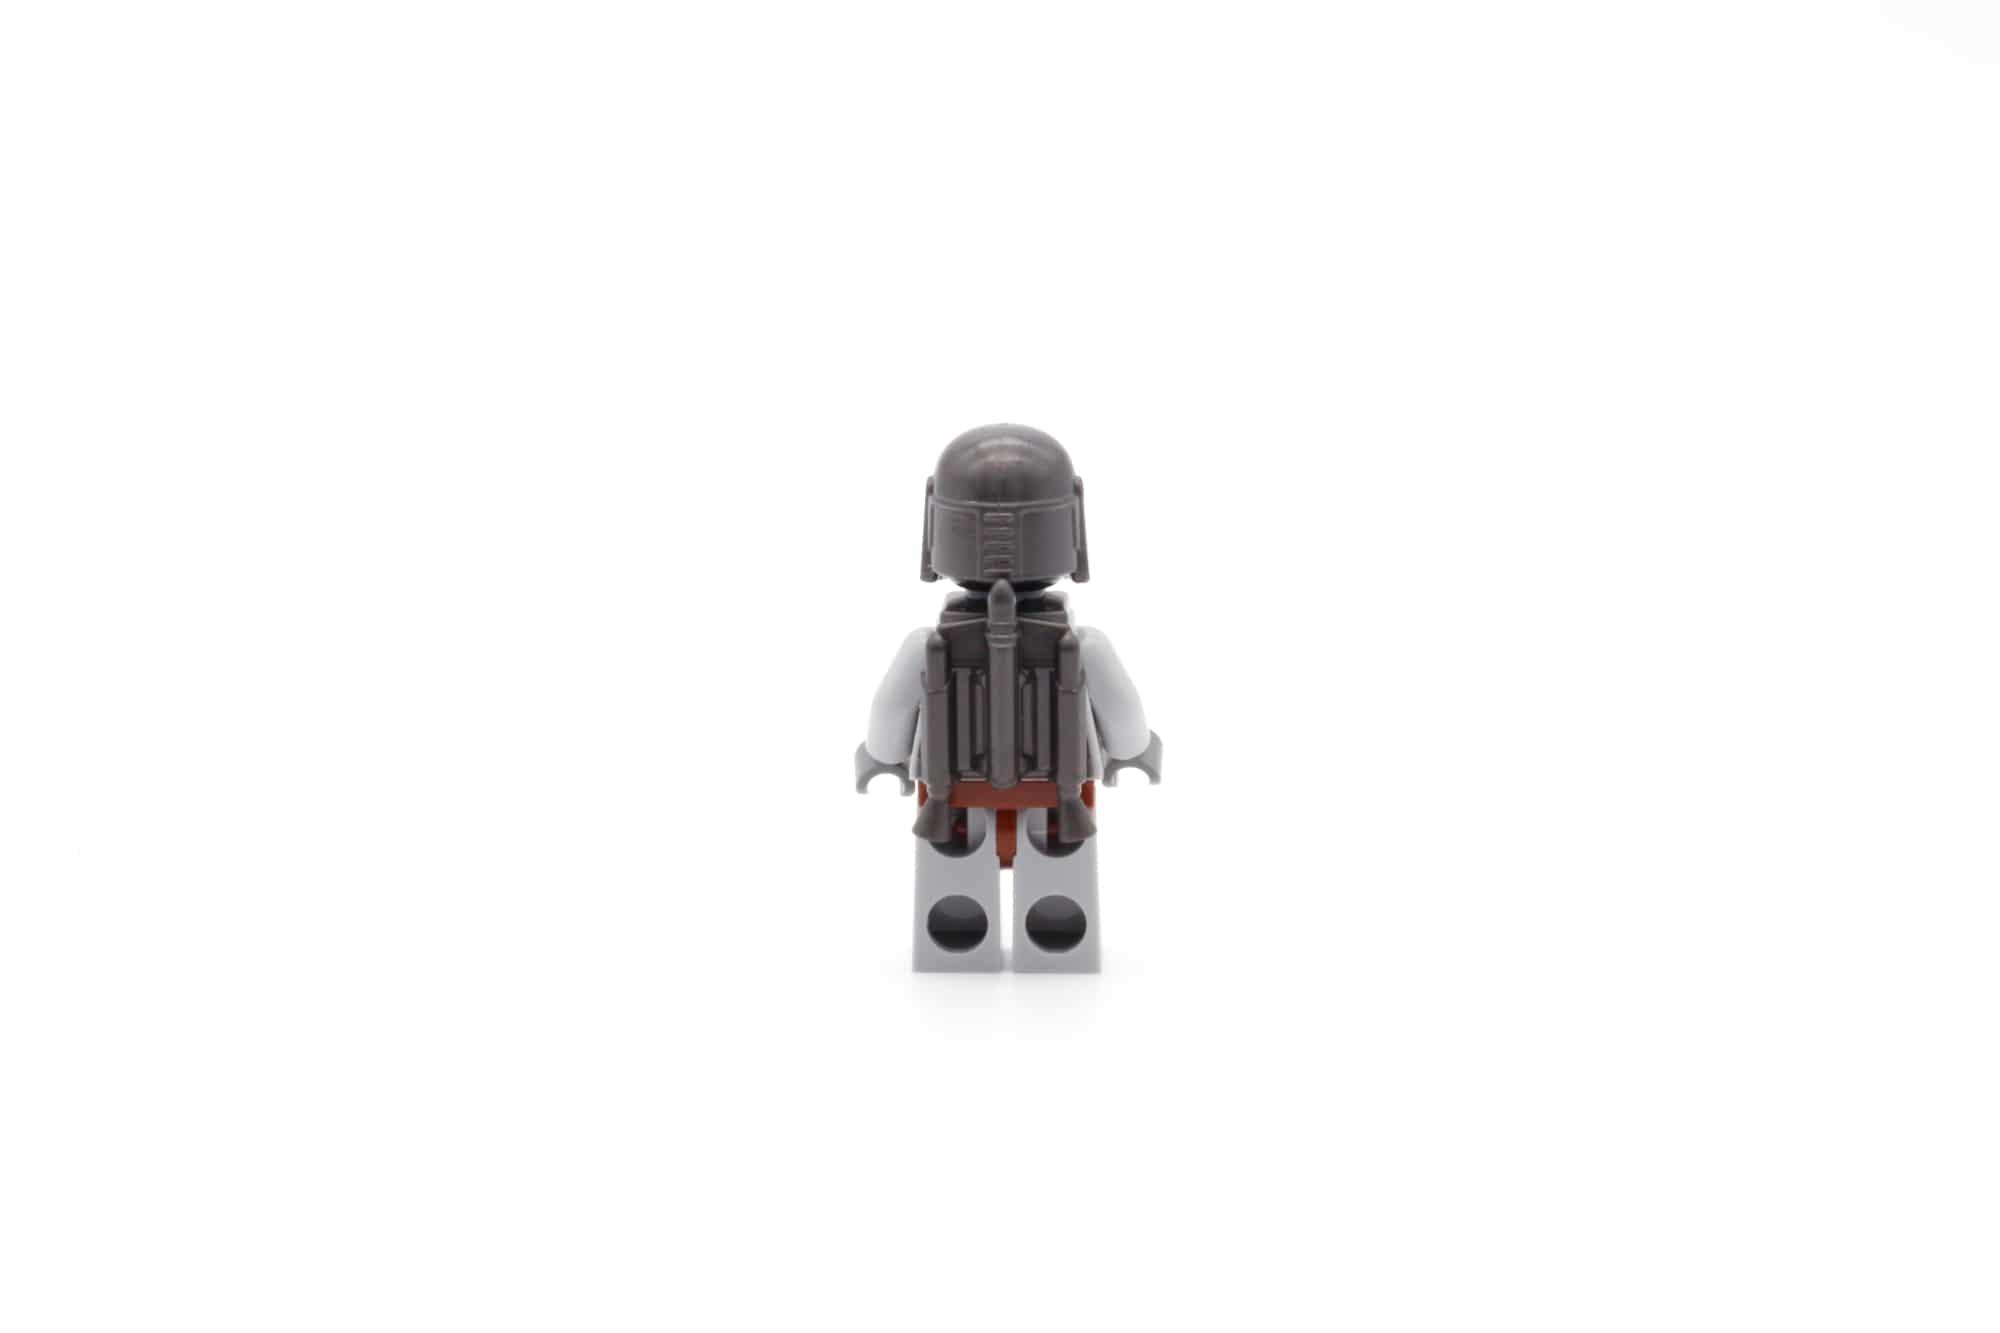 LEGO Star Wars 75316 Mandalorian Starfighter 13